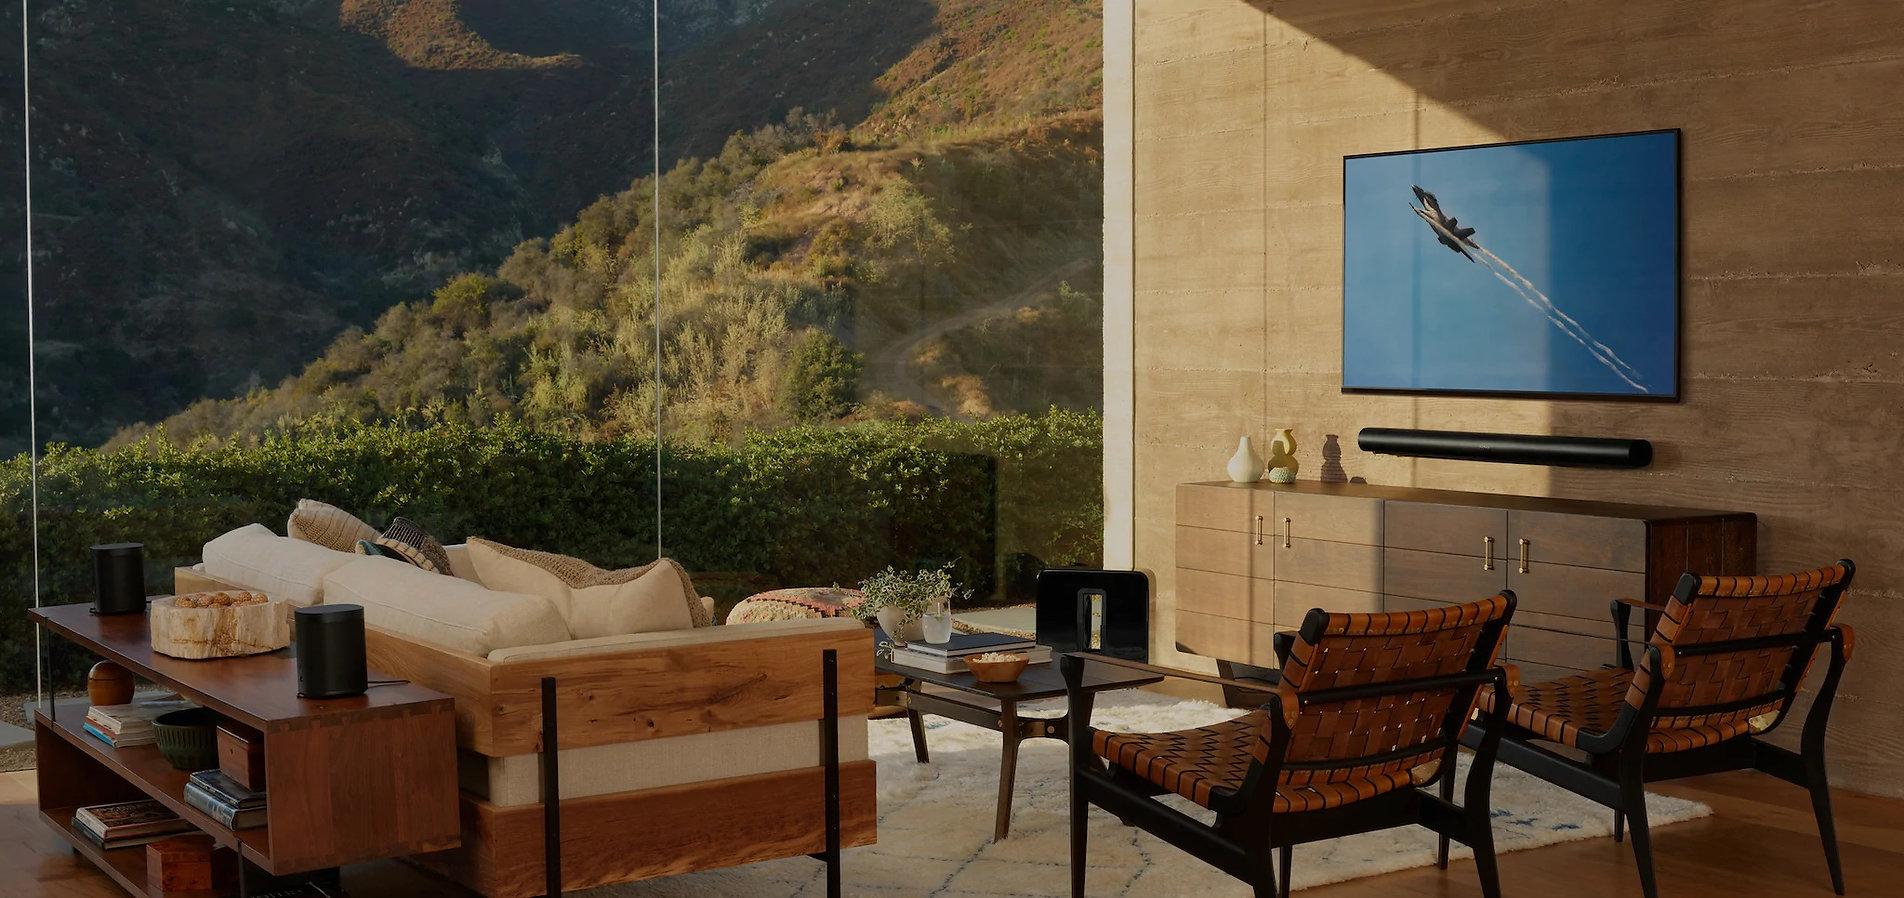 television-and-soundbar-dorset.jpg